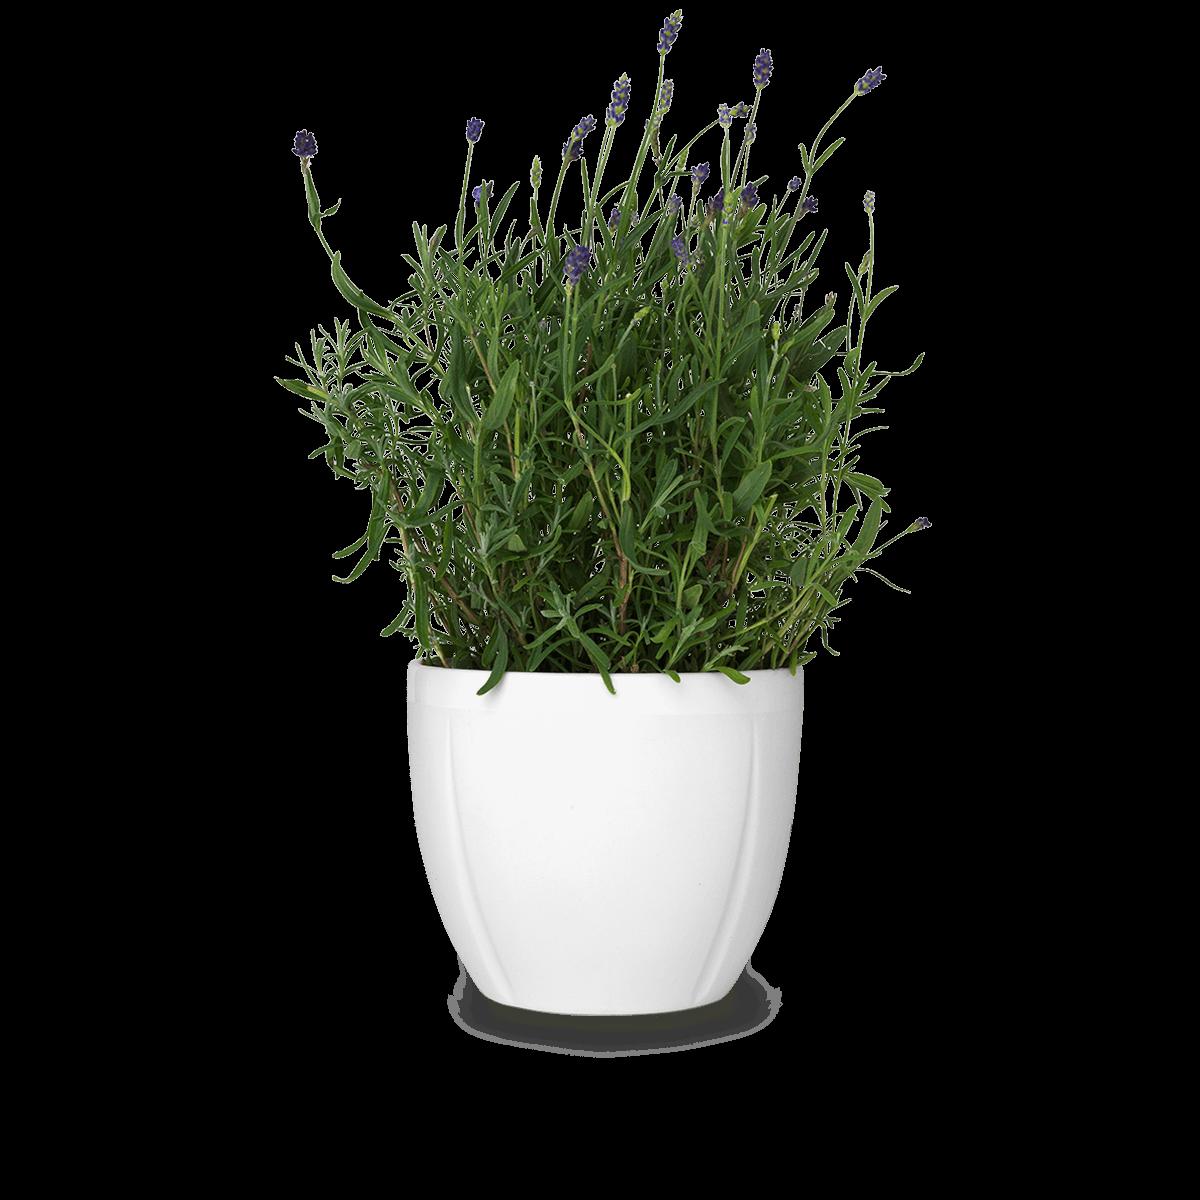 Flower Pot PNG - 71294